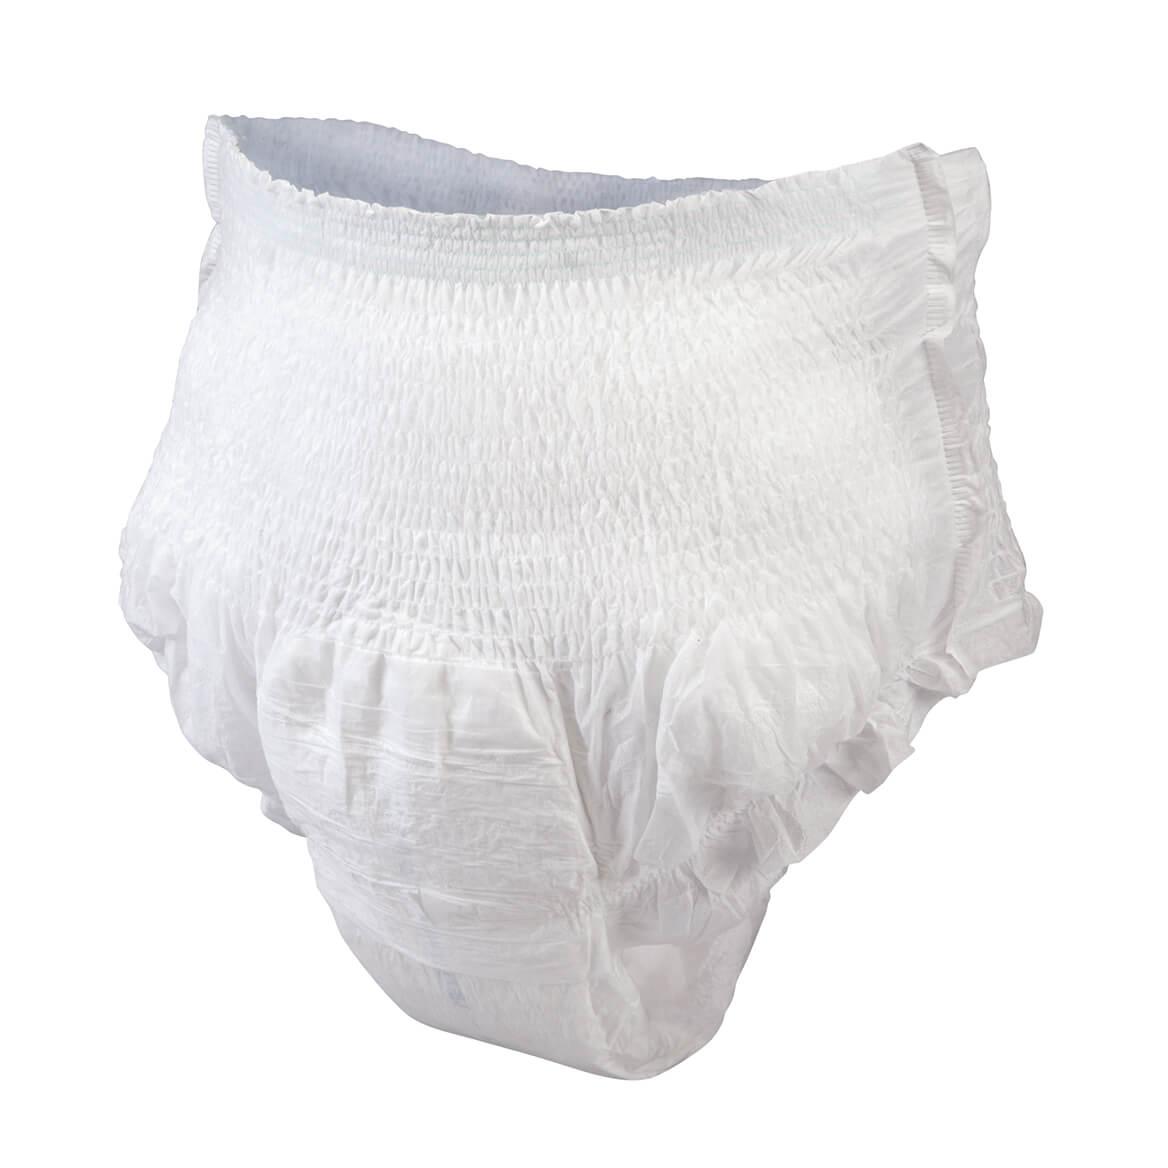 Unisex Overnight Protective Underwear, case-344825